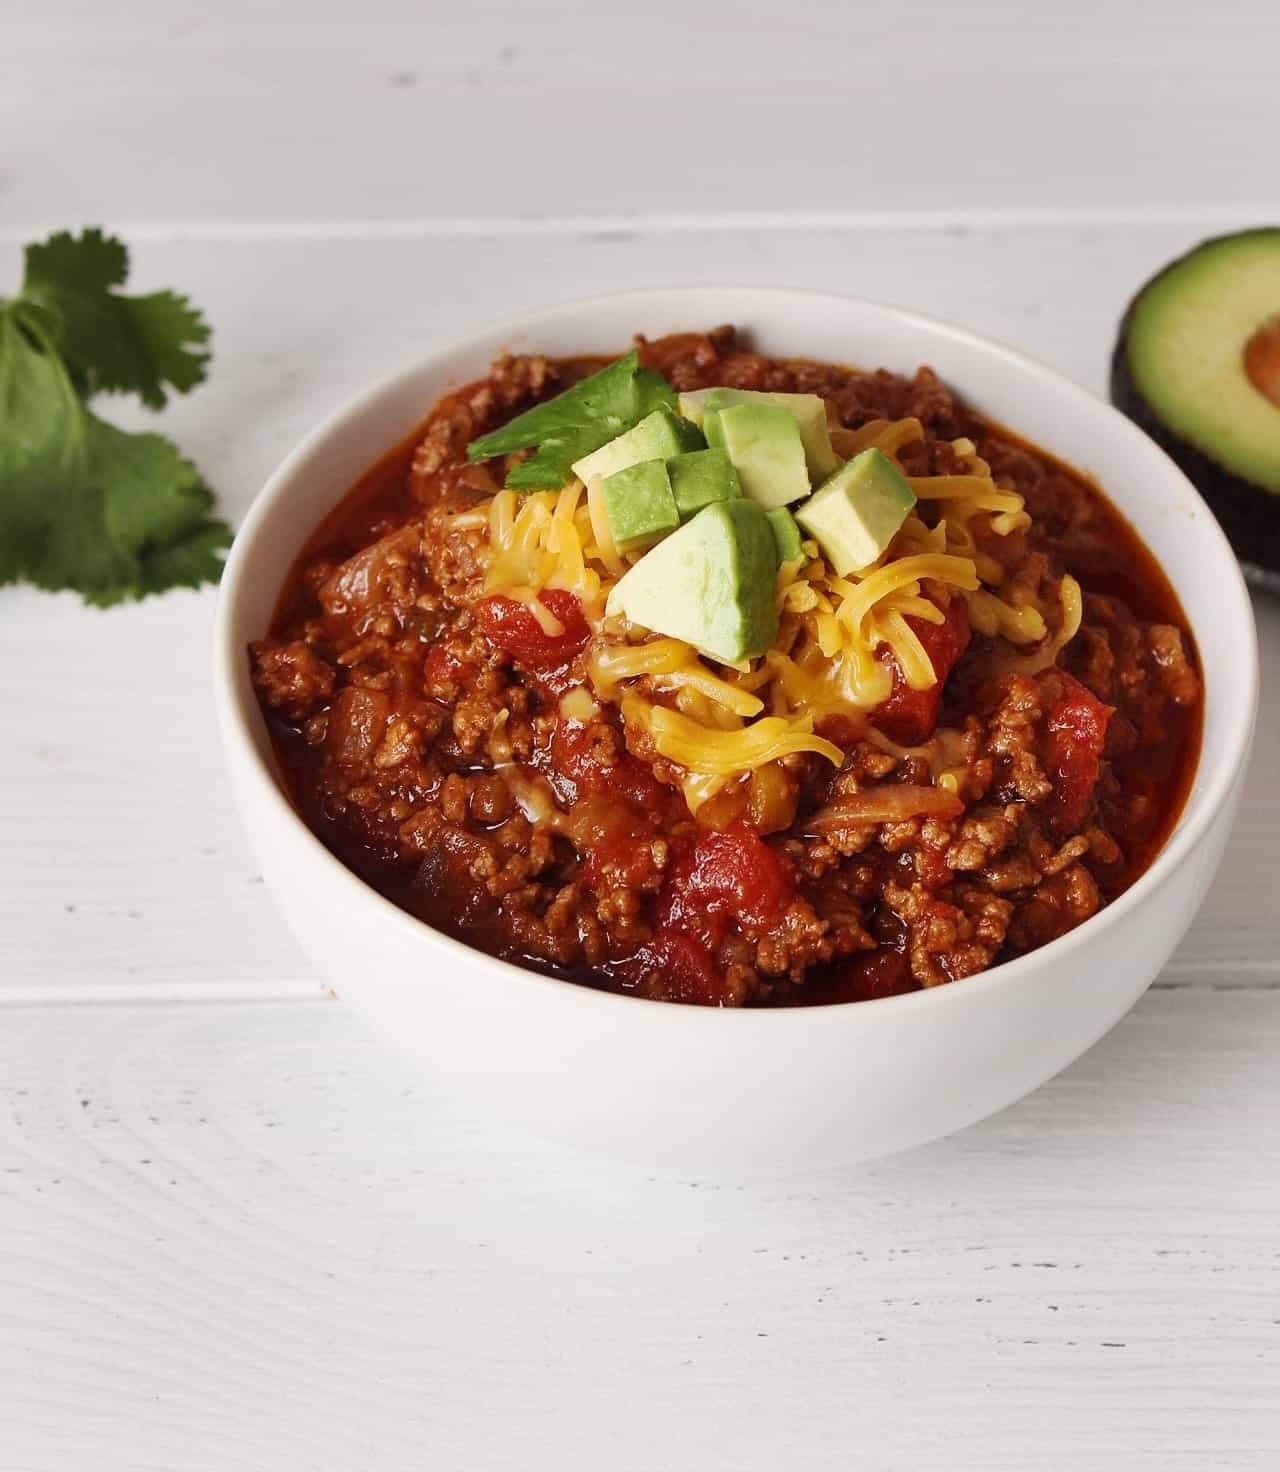 35 Keto Crockpot Recipes To Prep In 15 Minutes!